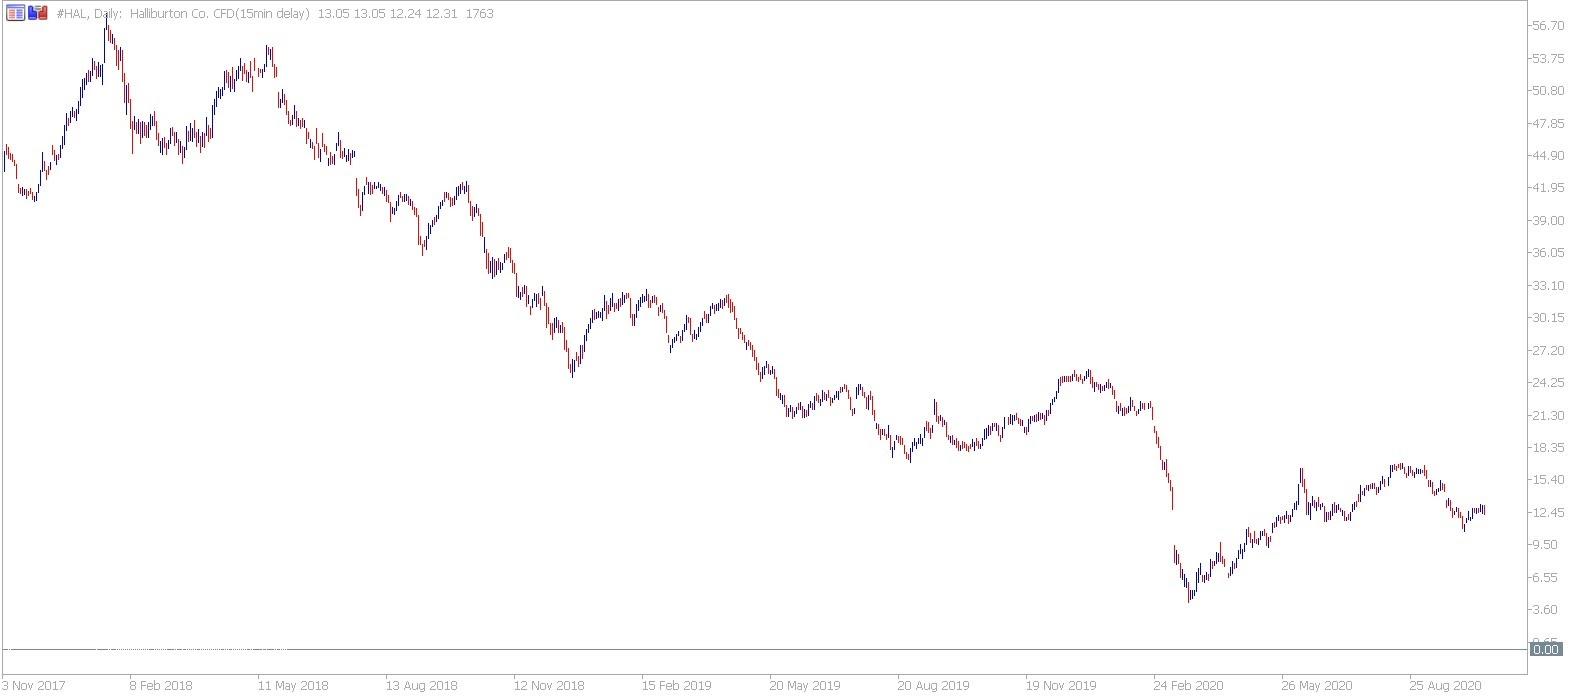 Admiral Markets MetaTrader 5. Halliburton CFD Daily Chart